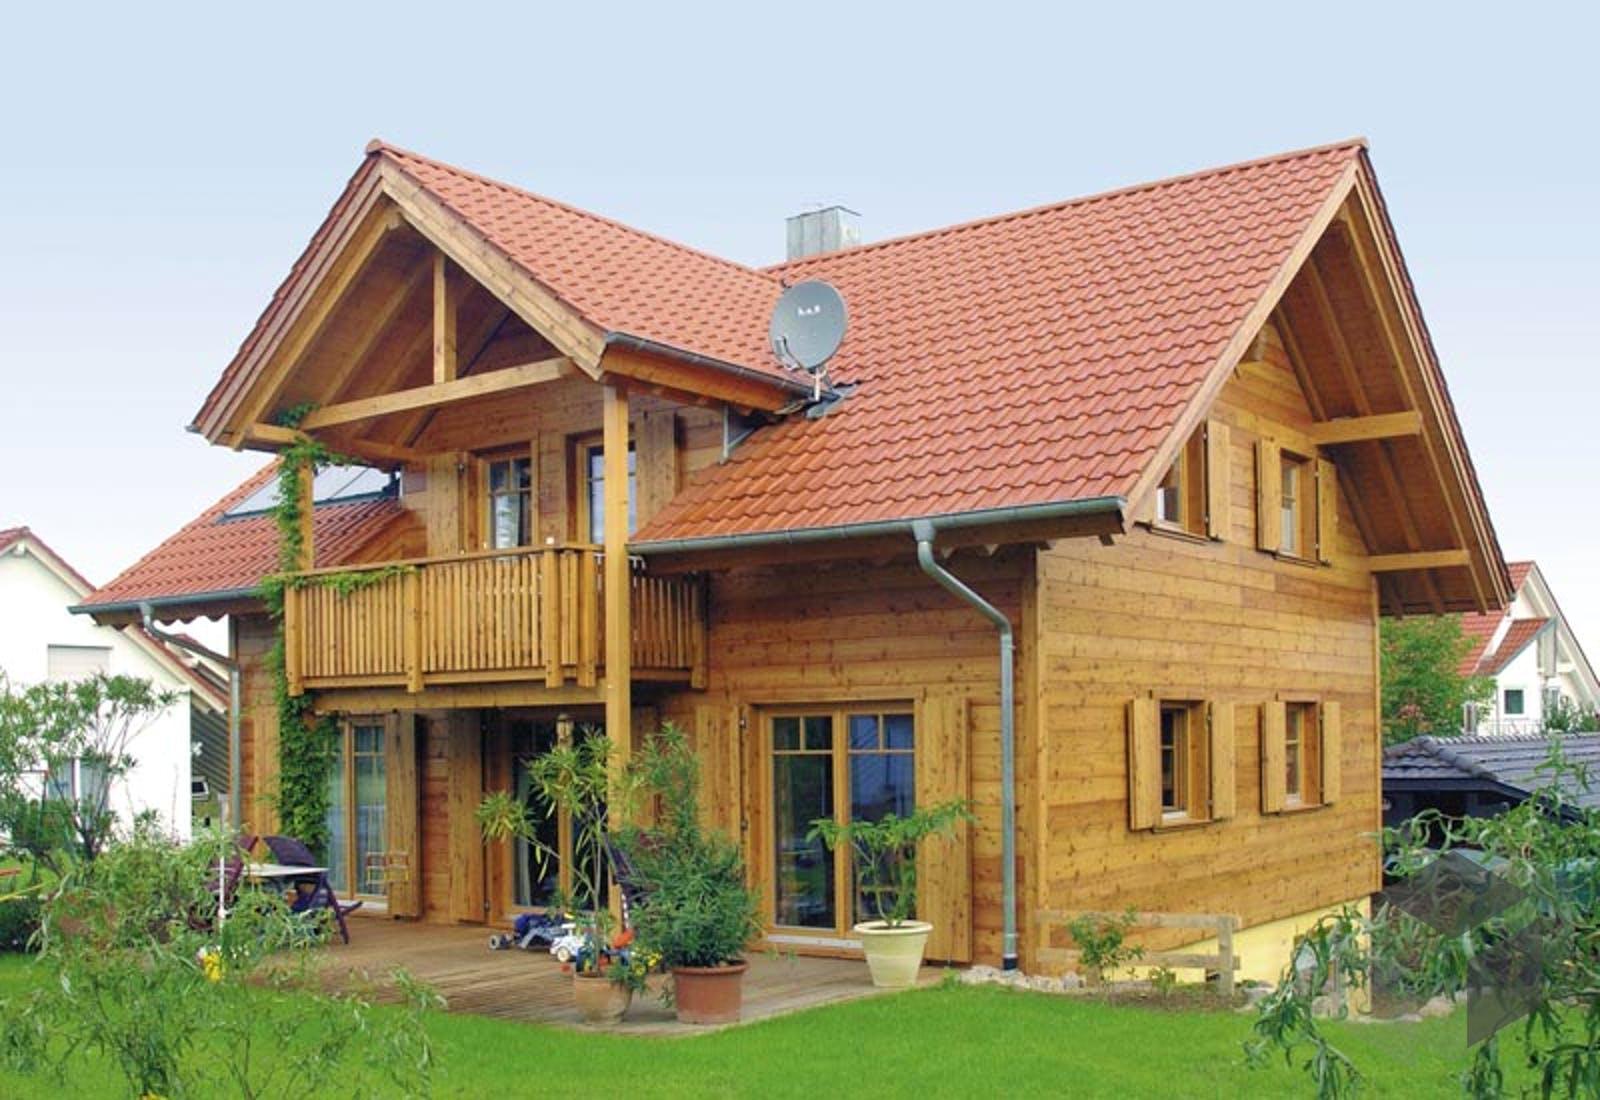 High Quality Holz 136